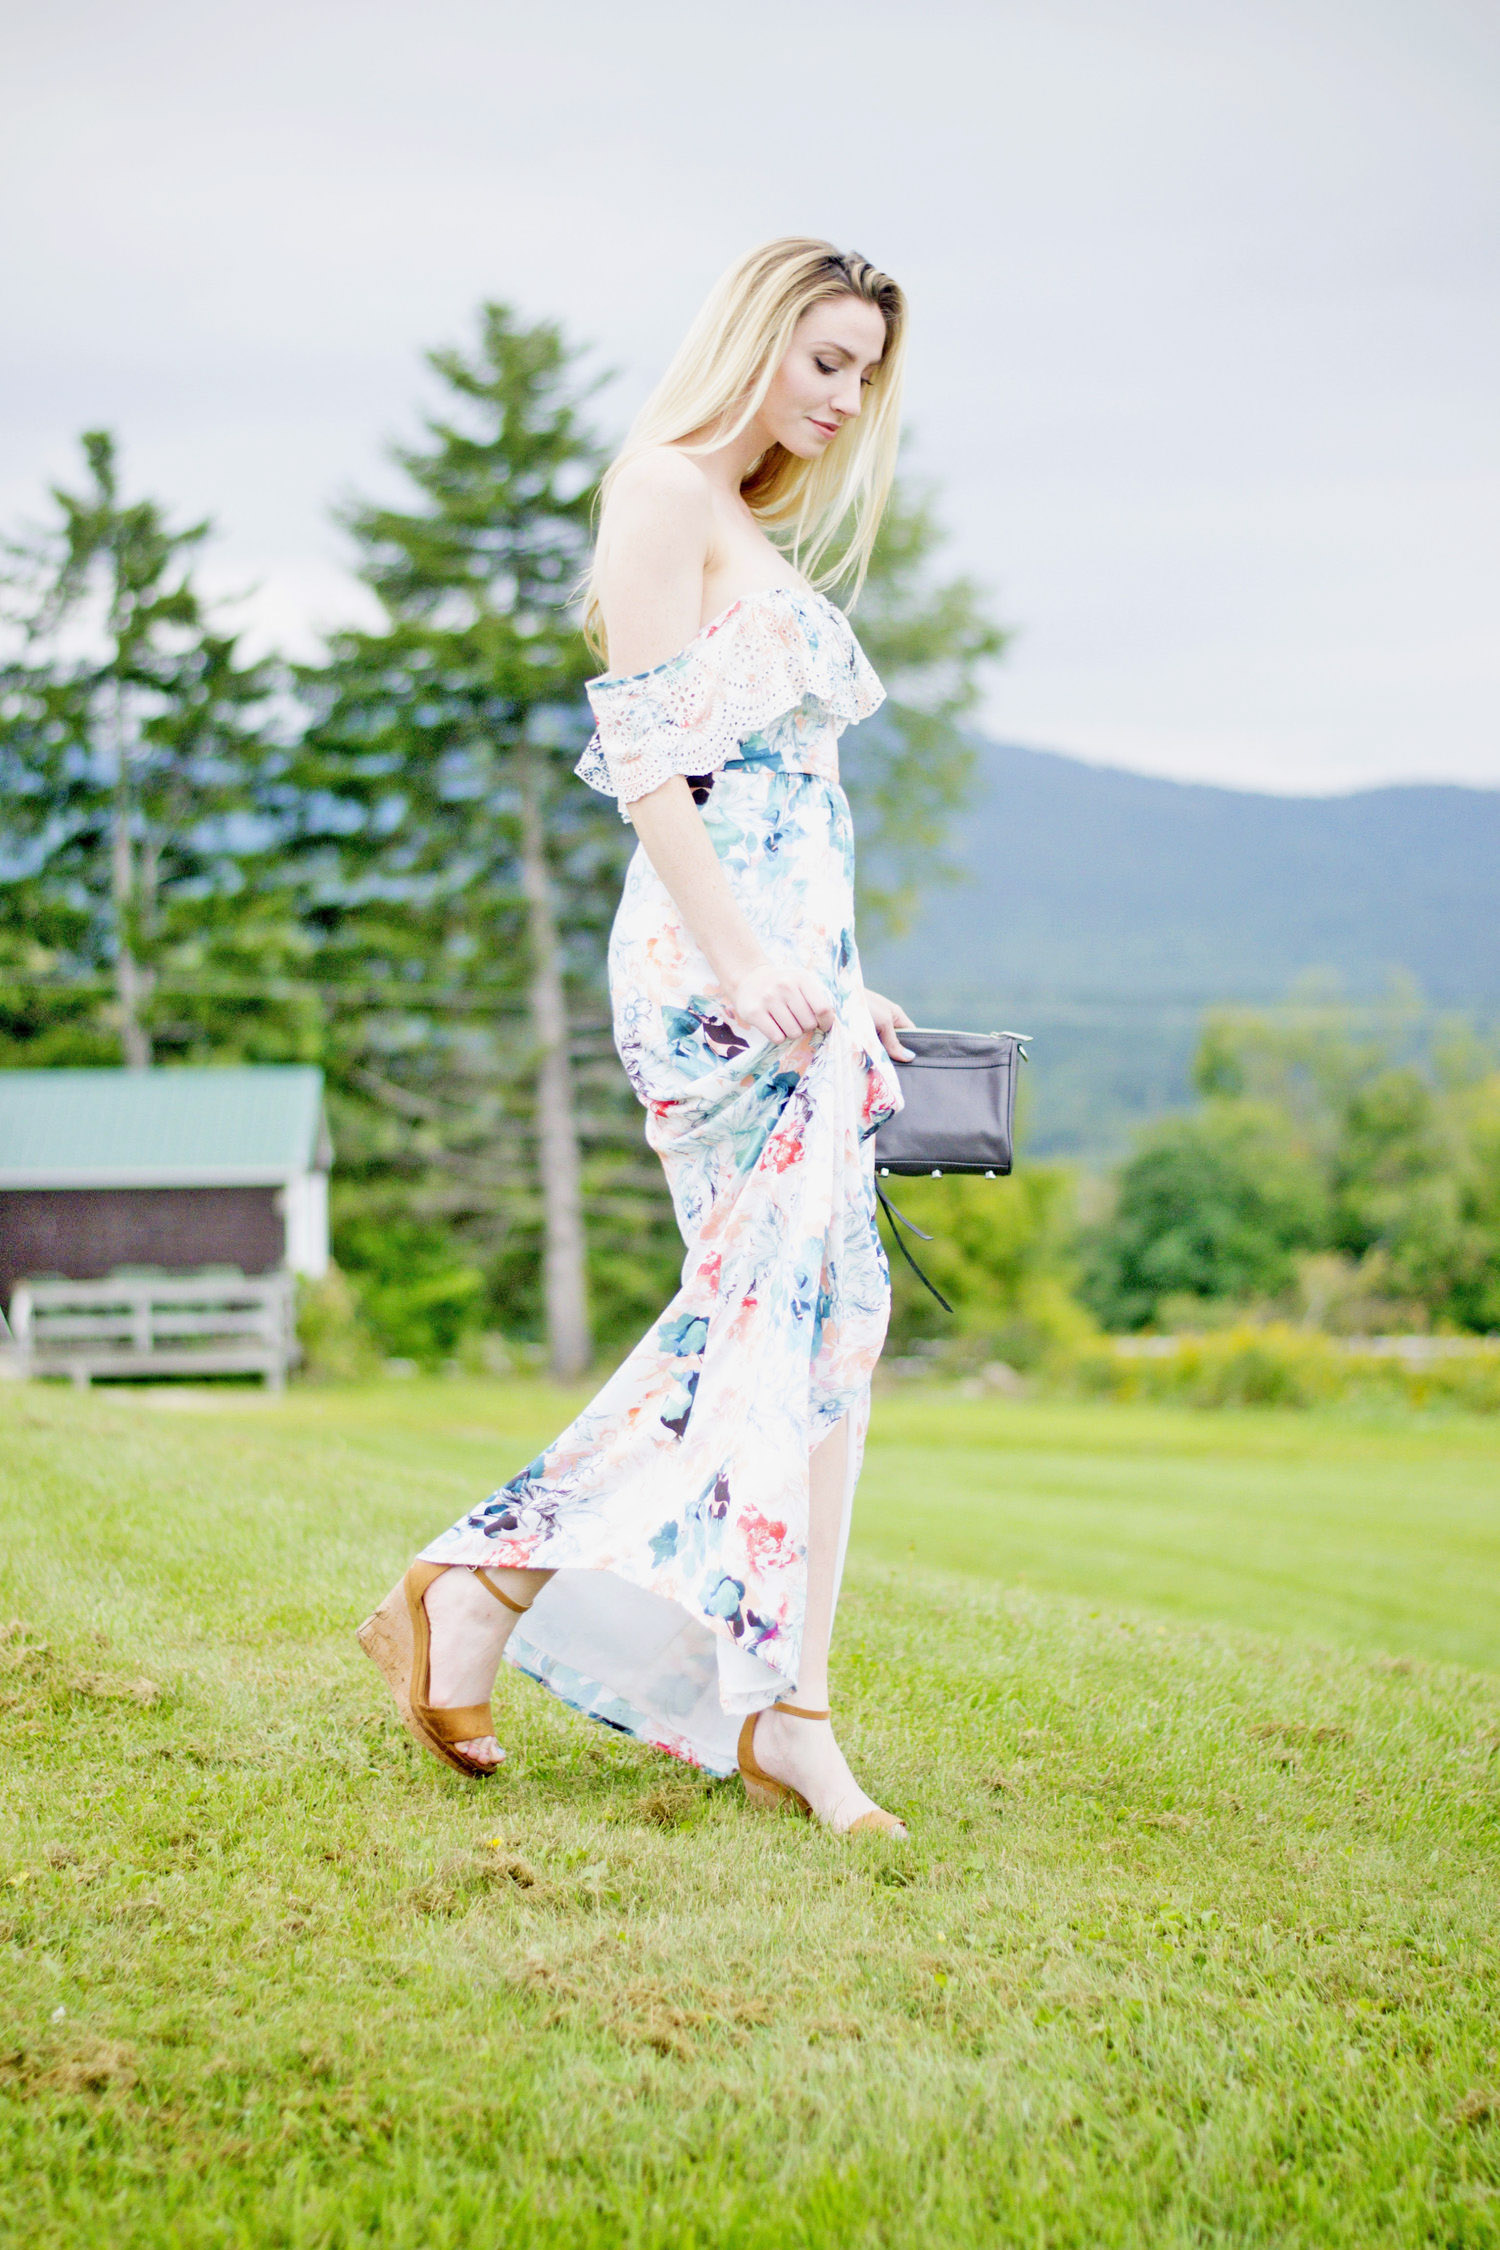 Floral Off-The-Shoulder Maxi Dress (via Chic Now)